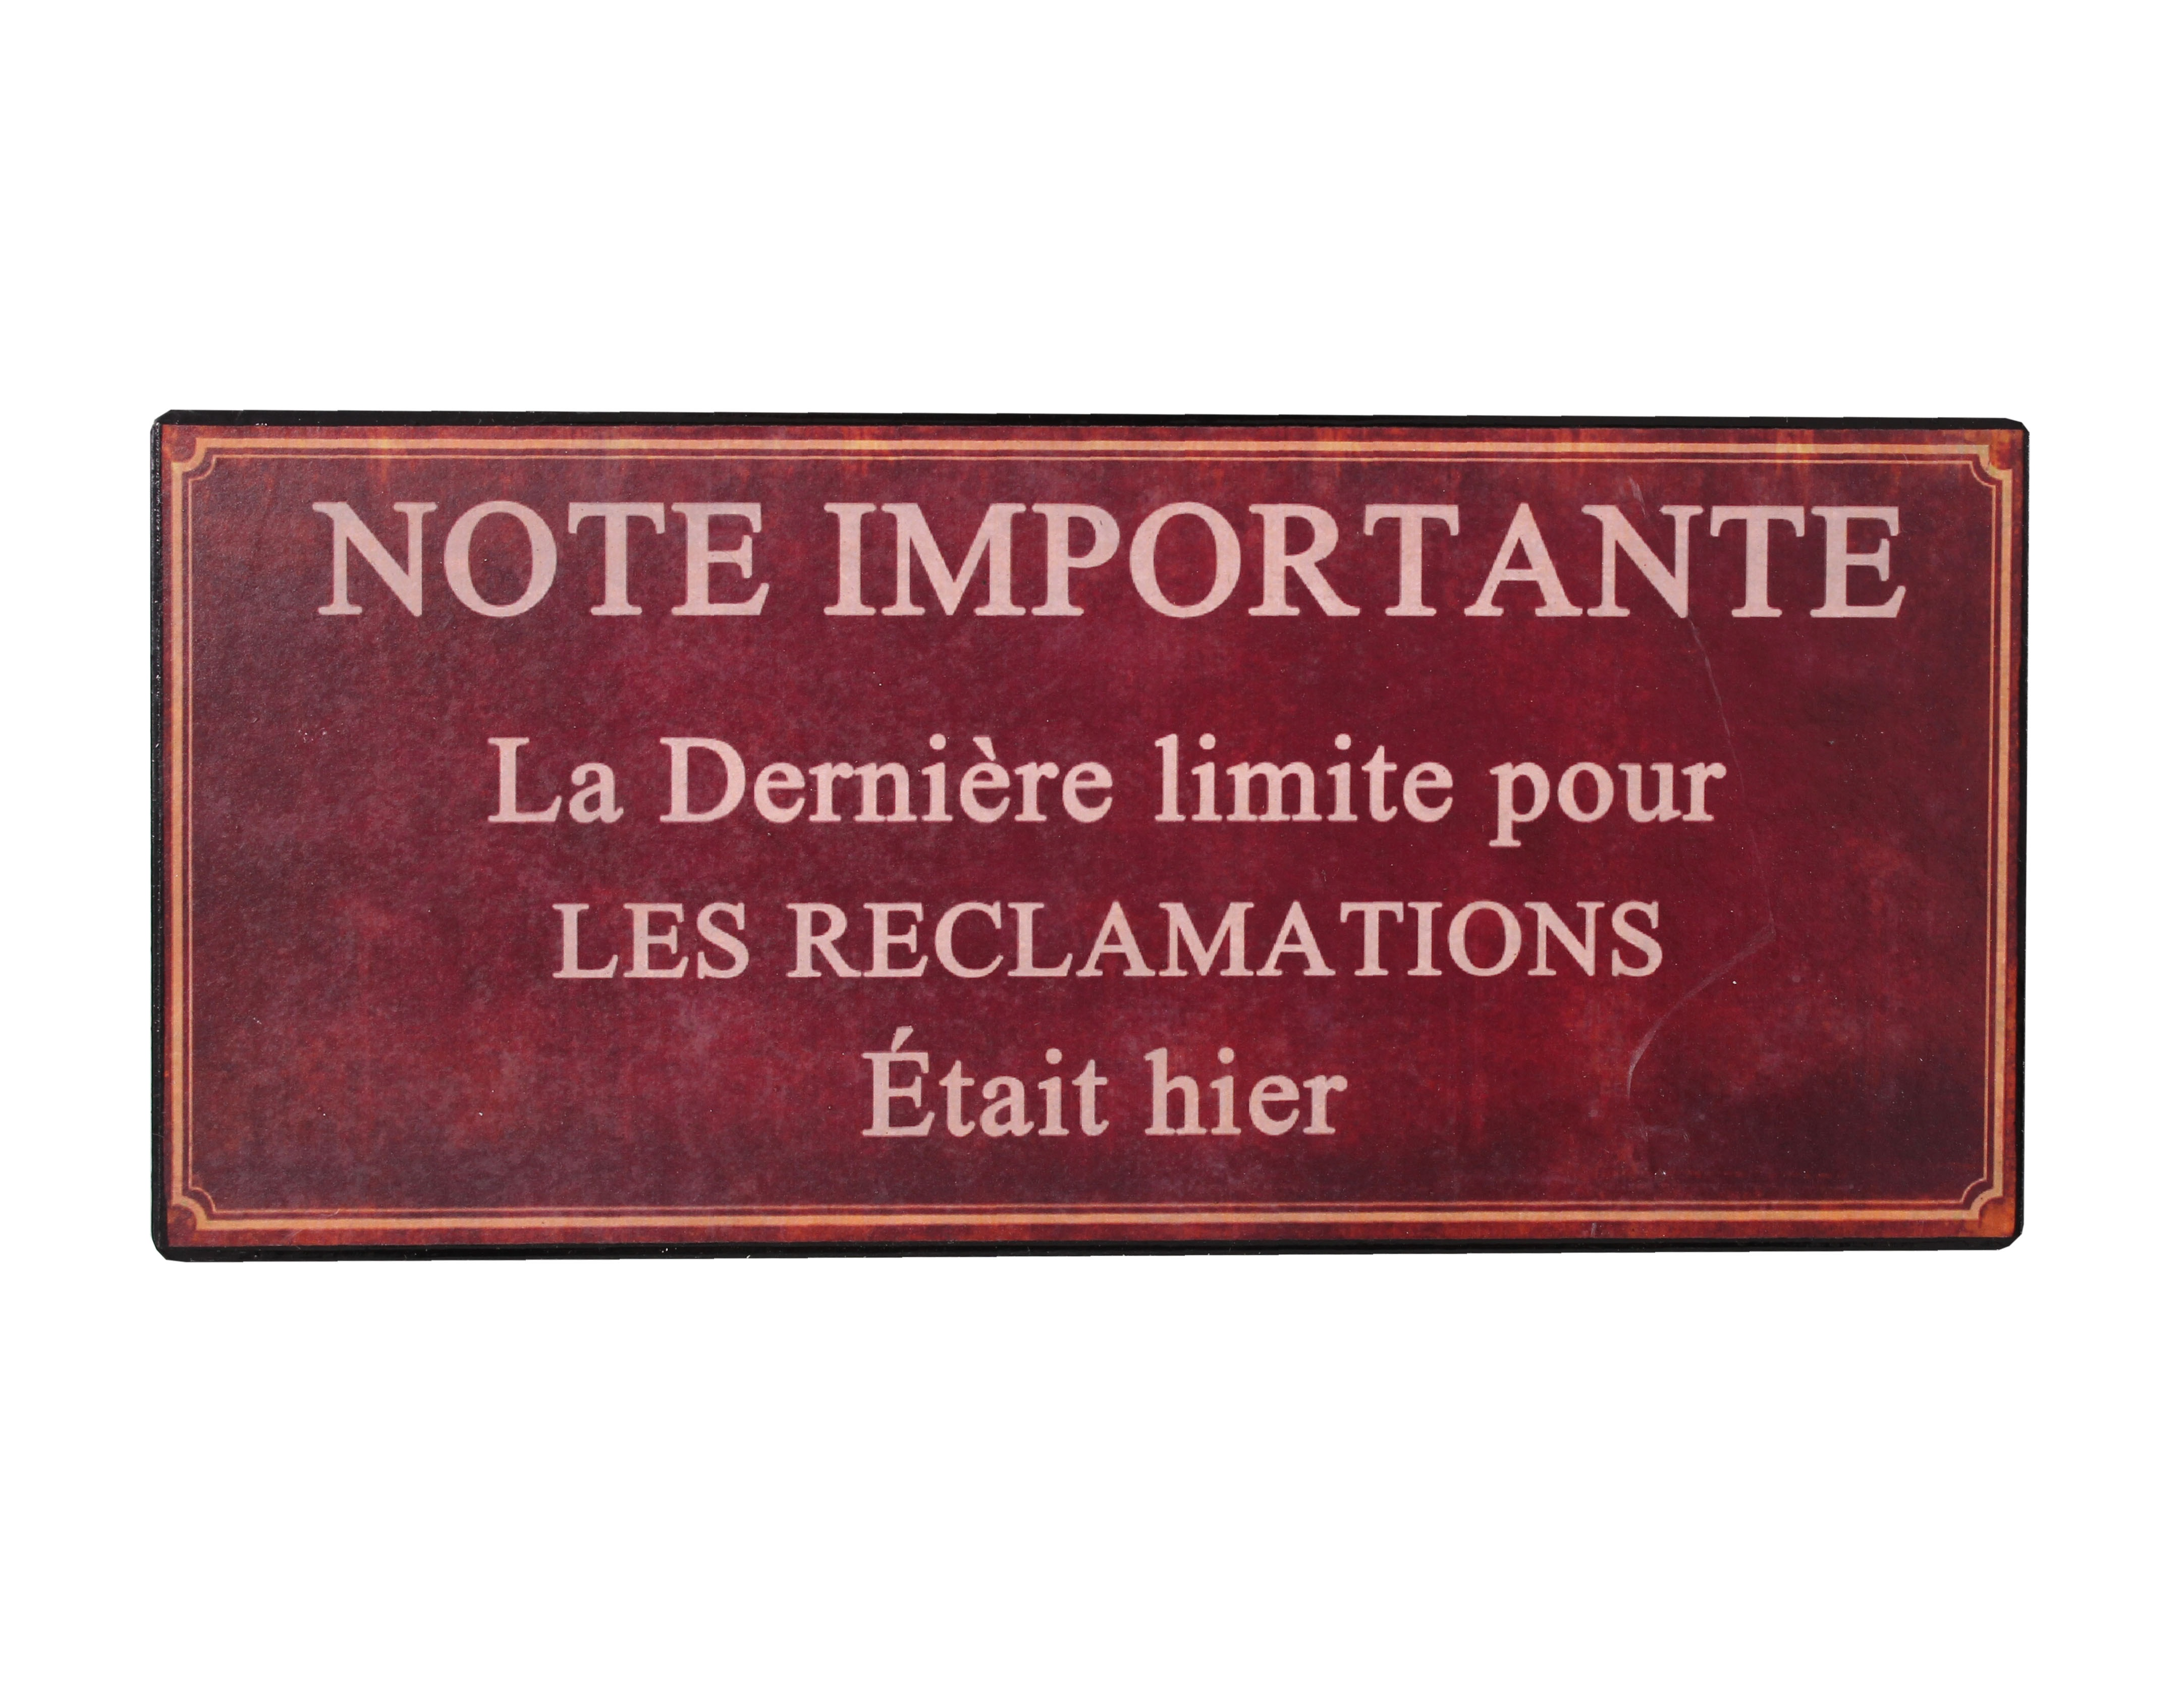 Декоративная табличка Note ImportanteДругое<br>Материал: Железо, бумага<br><br>Material: Железо<br>Length см: None<br>Width см: 22<br>Depth см: 0.33<br>Height см: 9.9